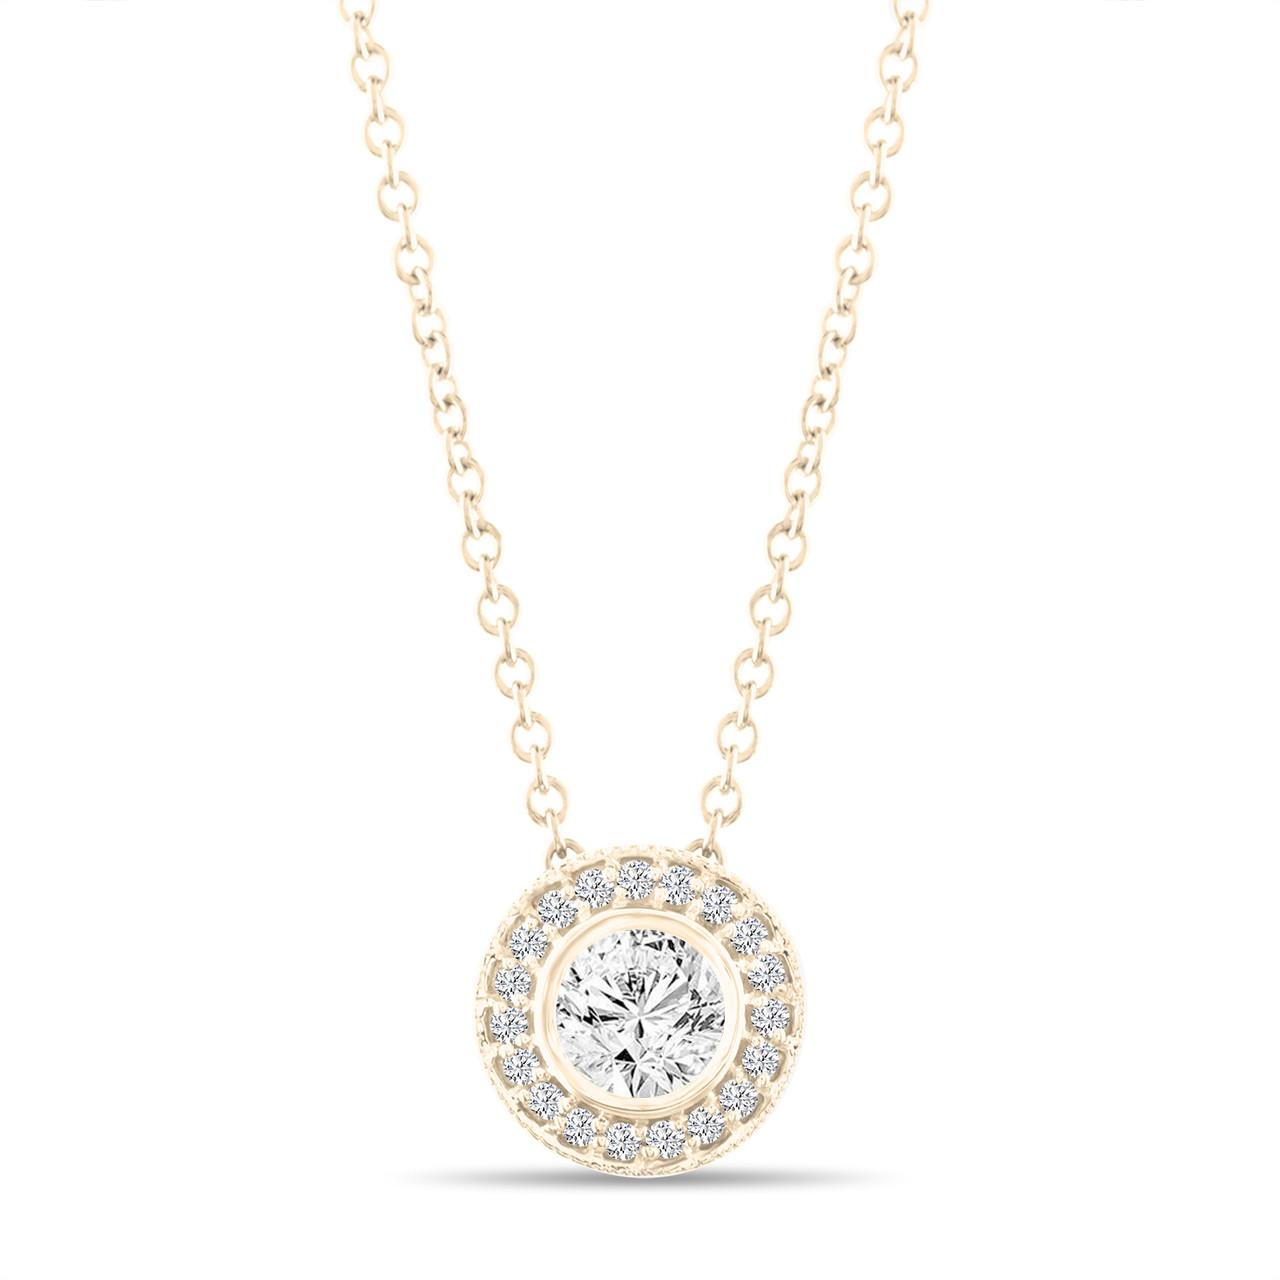 Micro Pave Diamond Pendant Necklace Yellow Gold Pendant 0 42 Carat Bezel Certified Handmade